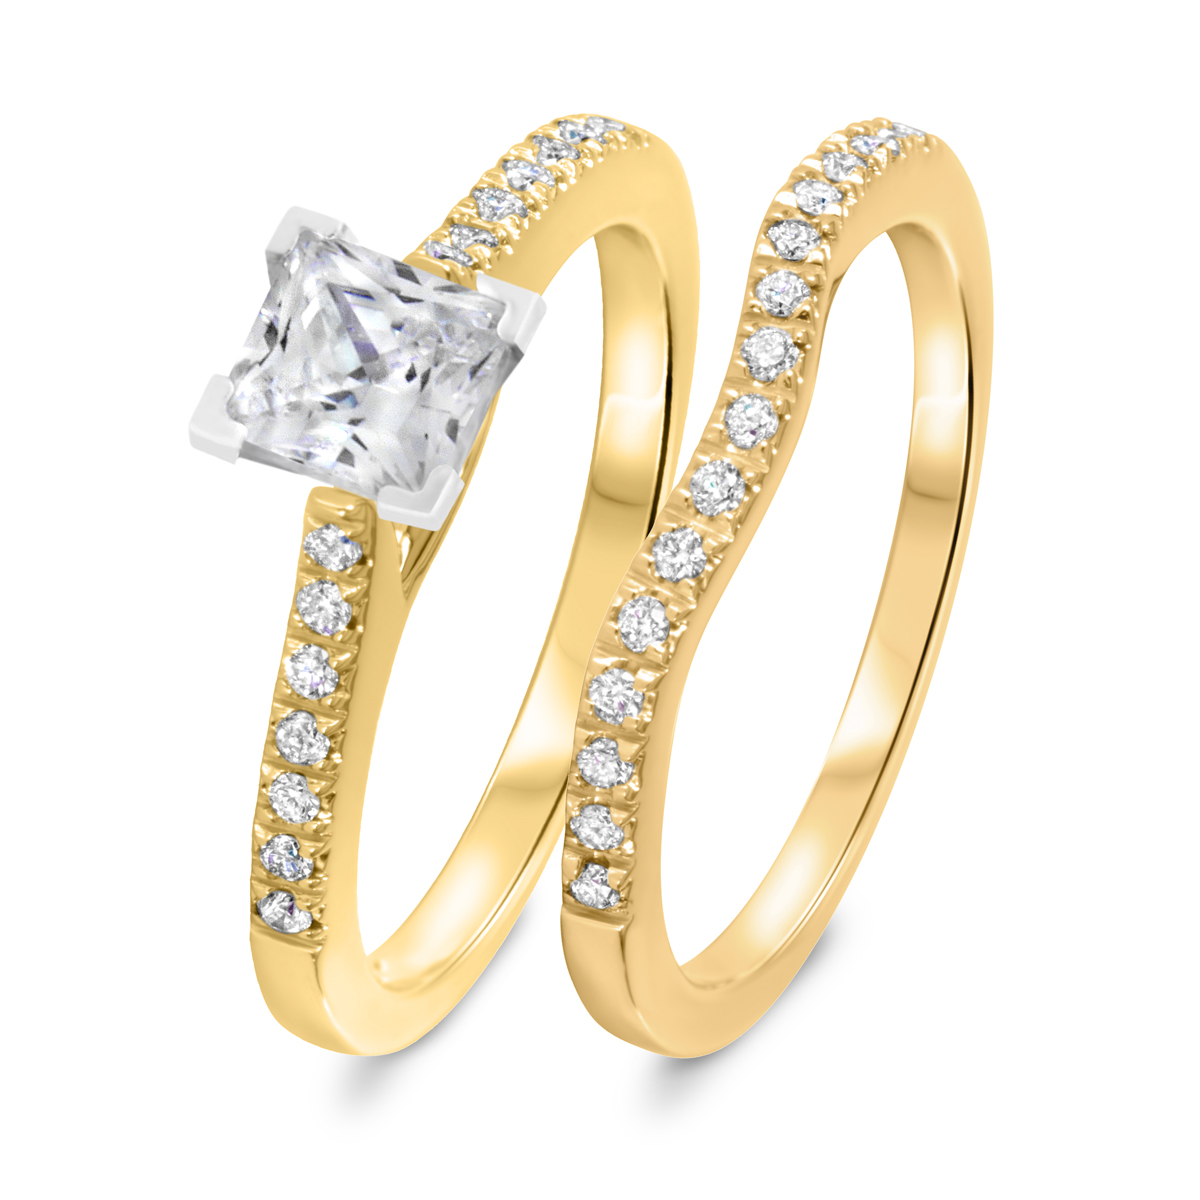 1 1/4 CT. T.W. Diamond Women's Bridal Wedding Ring Set 10K Yellow Gold